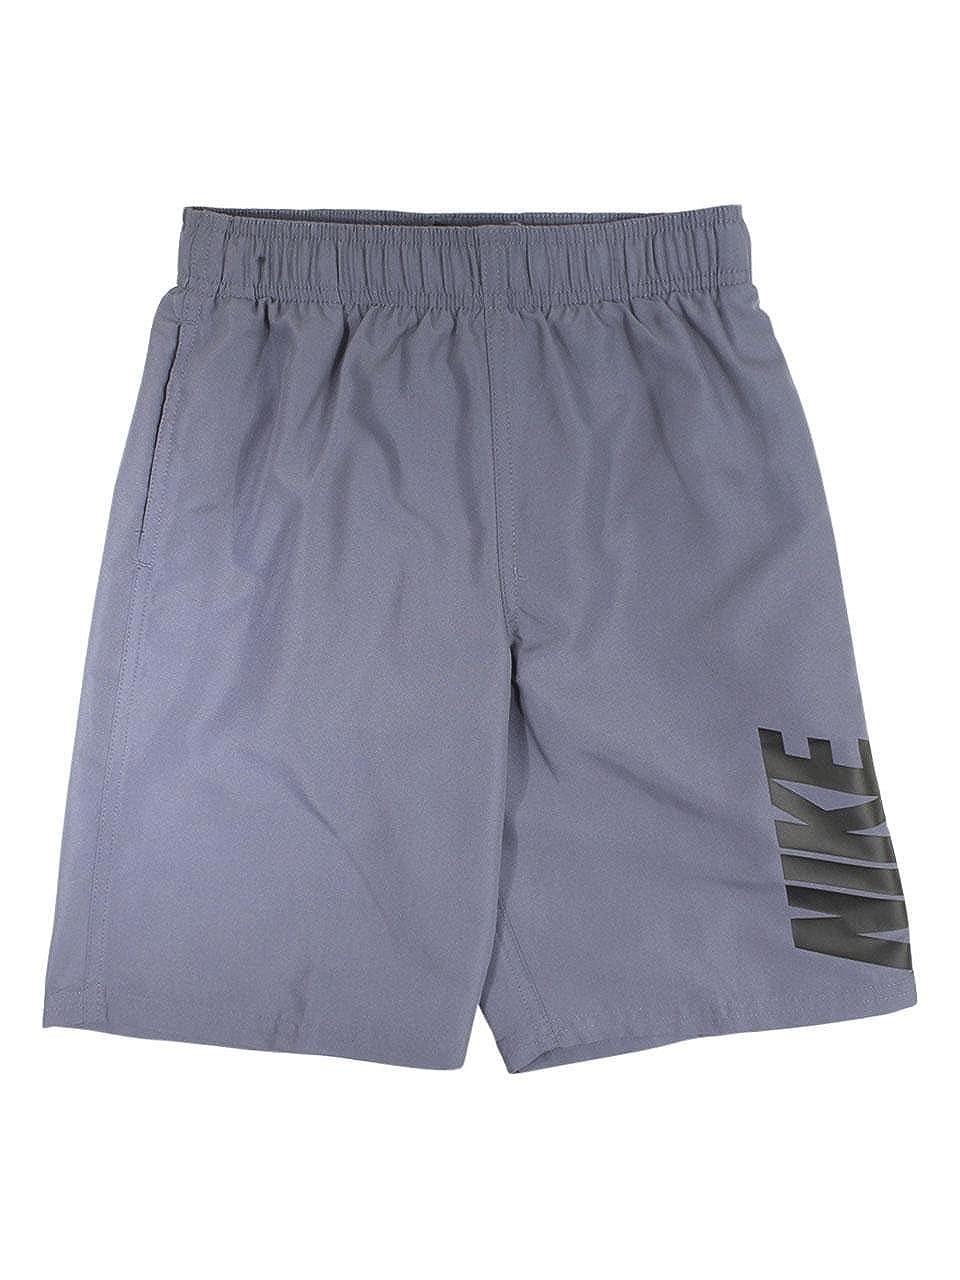 Light Carbon S Nike Big Boy's 8-inch Volley Shorts Trunks Swimwear